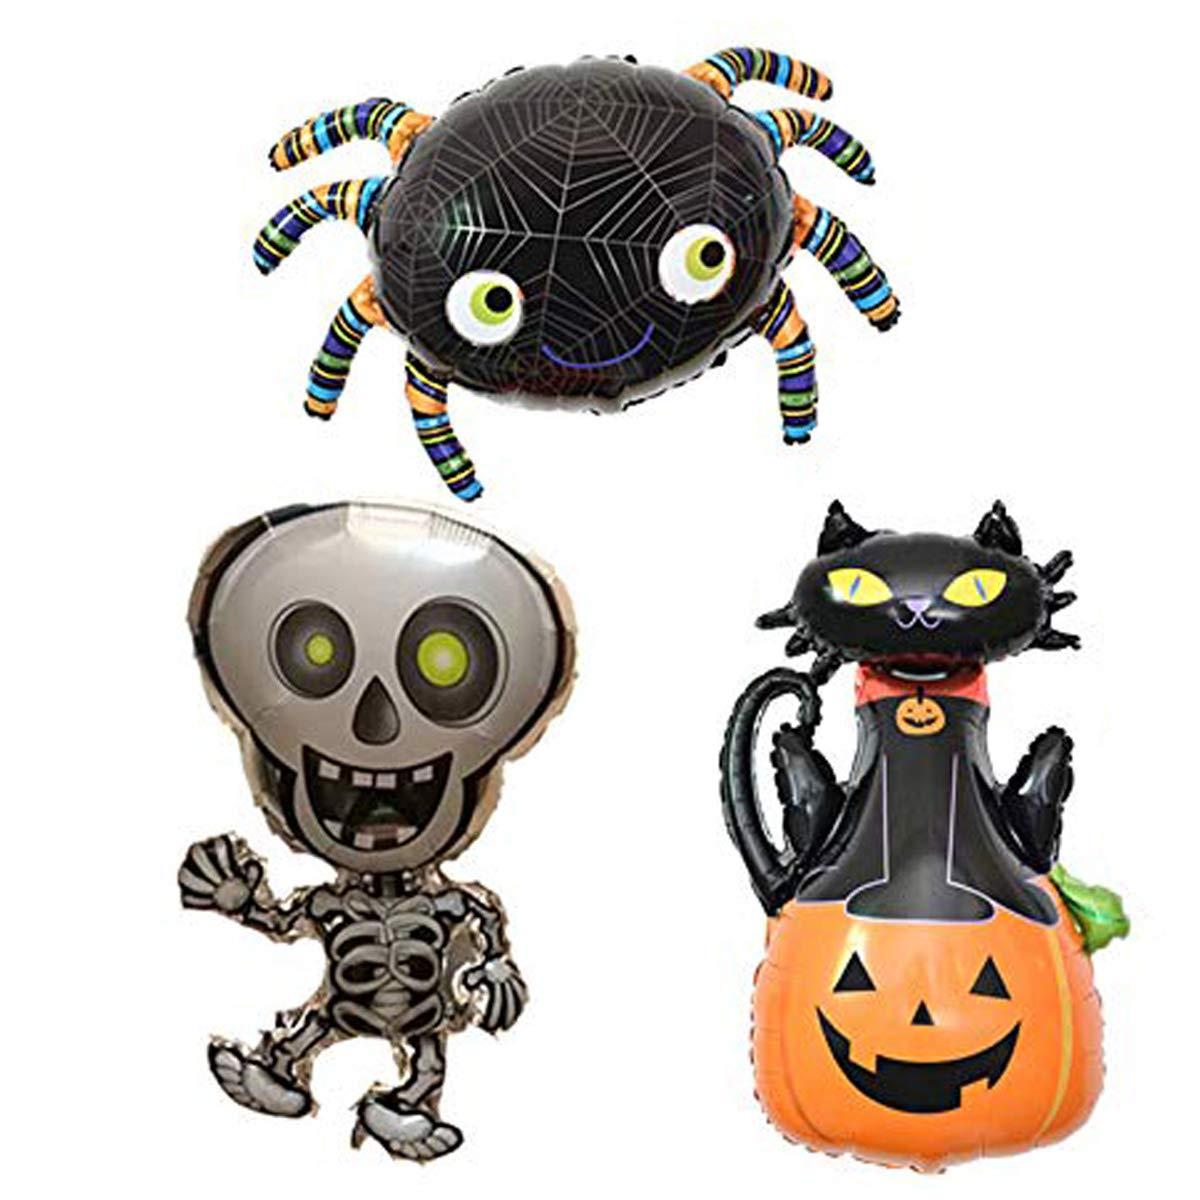 Bahpaud Paquete de Globos de Halloween de 3 Piezas Extra Grande Calabaza de Gato Negro Araña Globos de Papel Fantasma para decoración de Halloween Suministros de Fiesta de Halloween